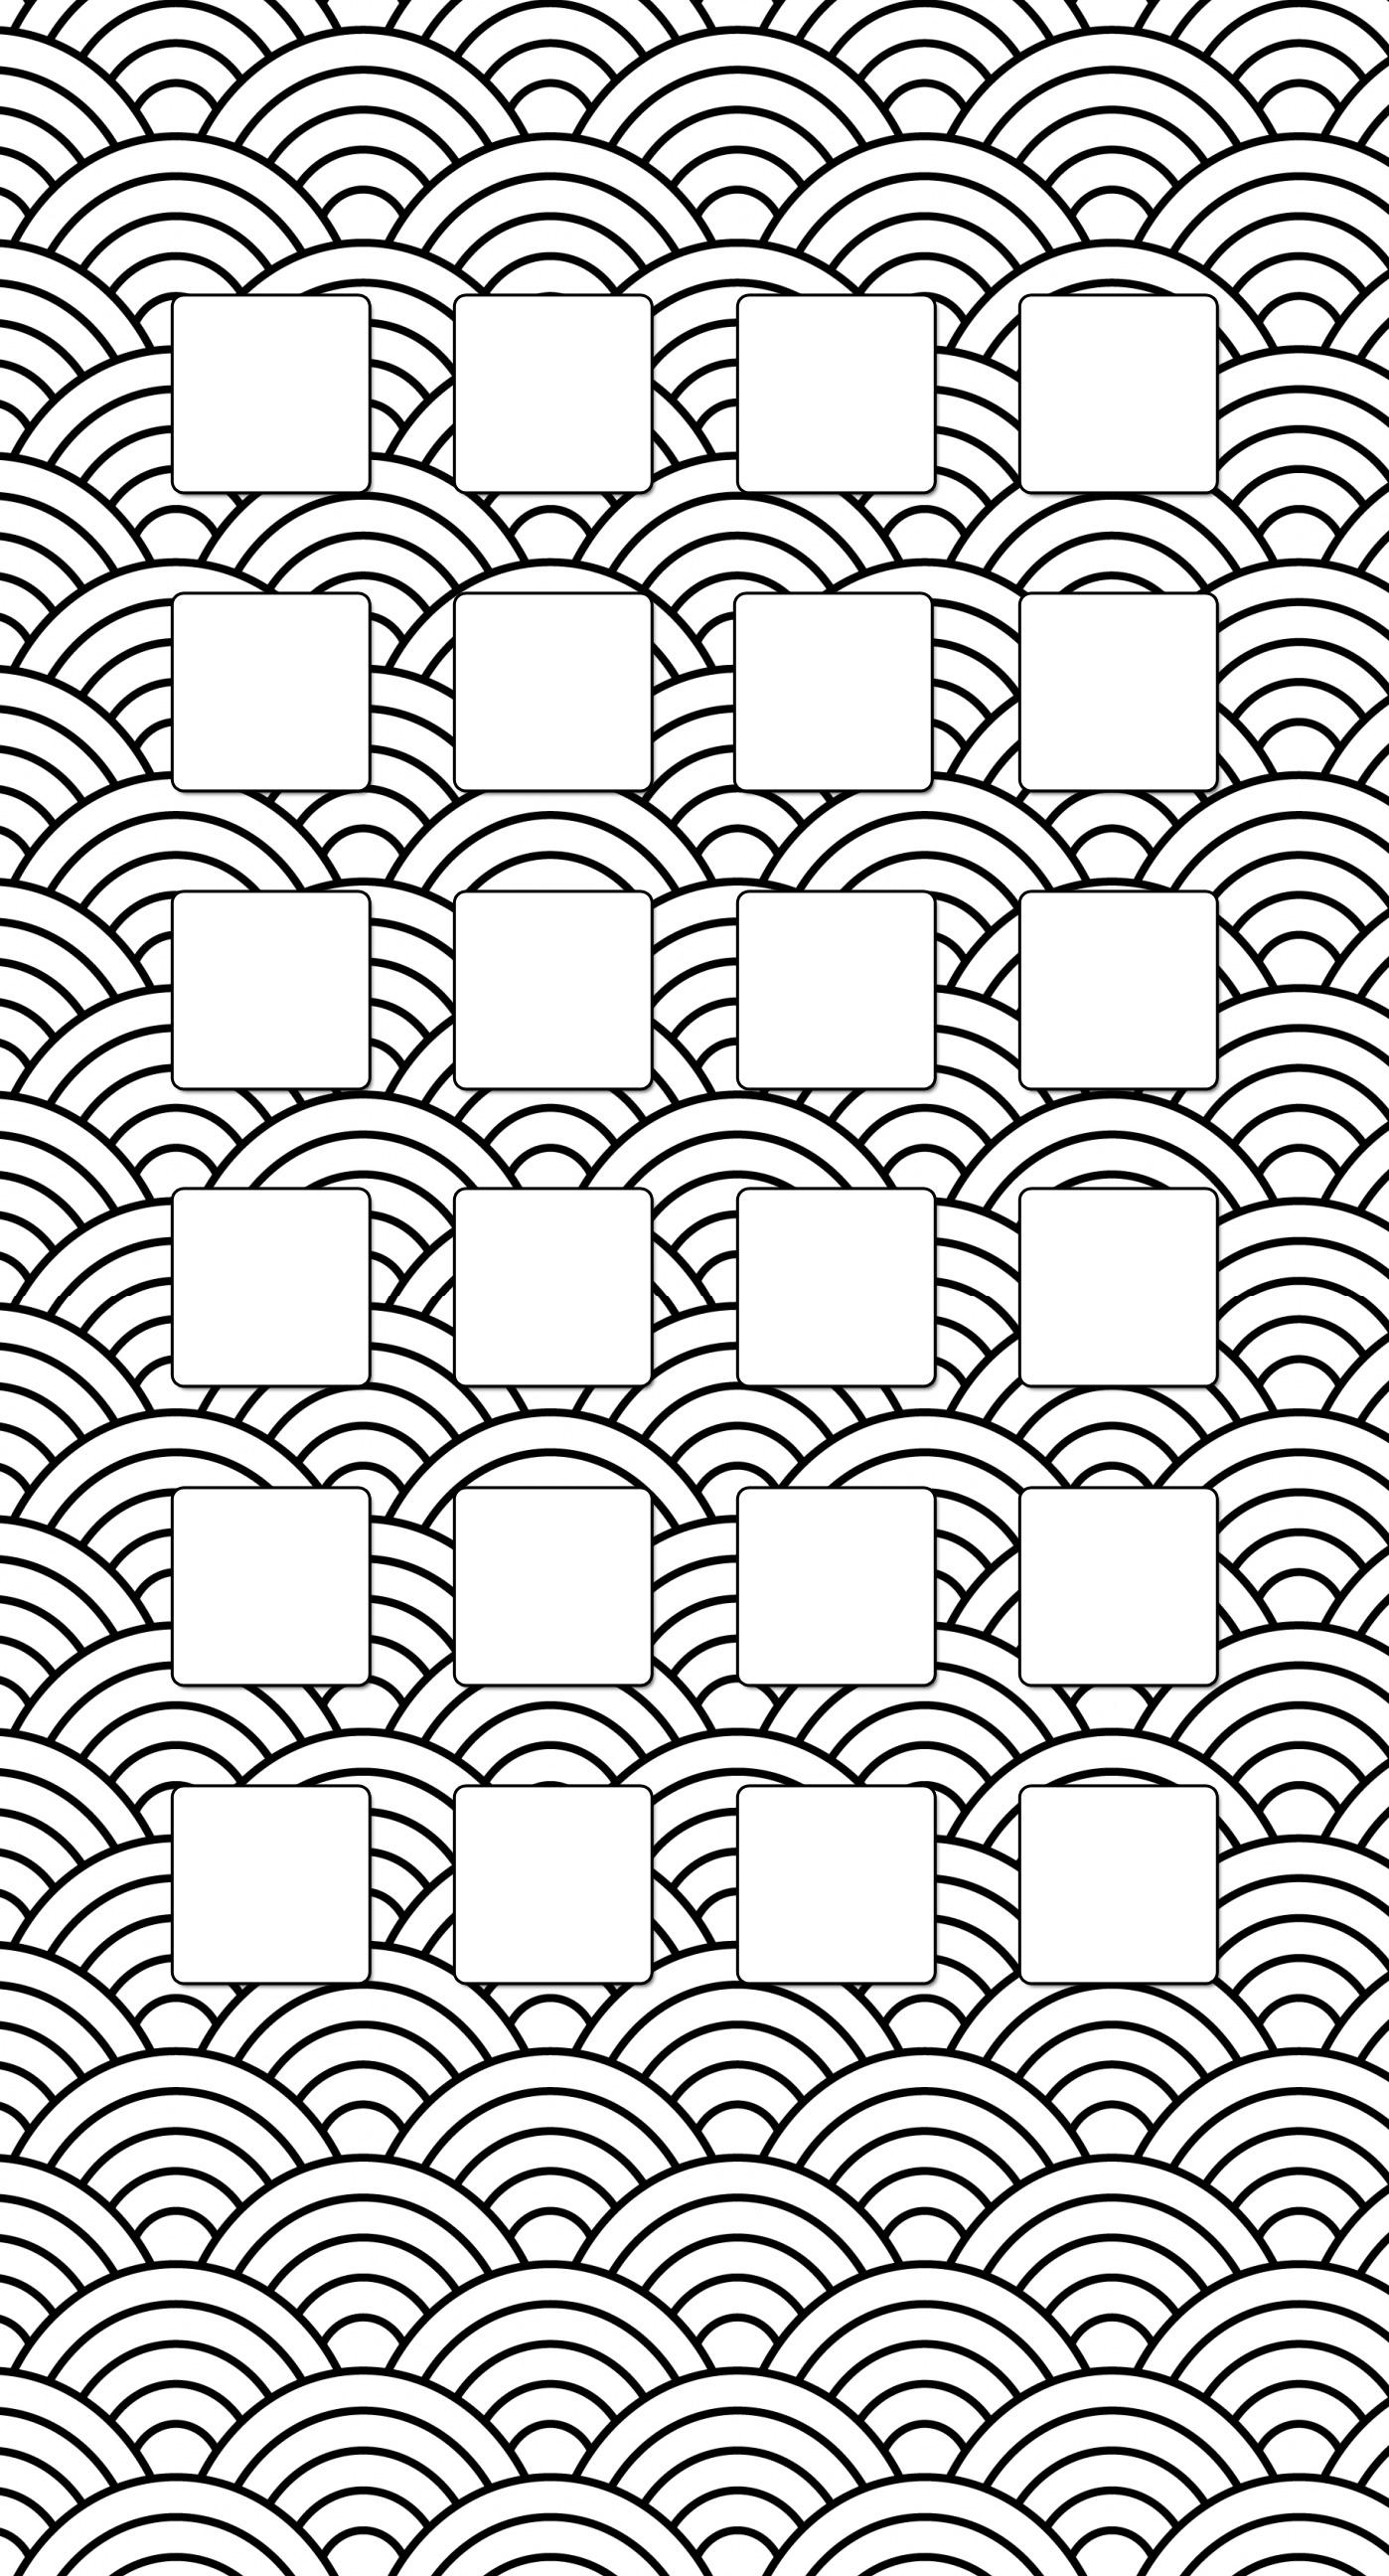 Shelf Simple New Year Spiral Black Wallpaper Sc Iphone7plus